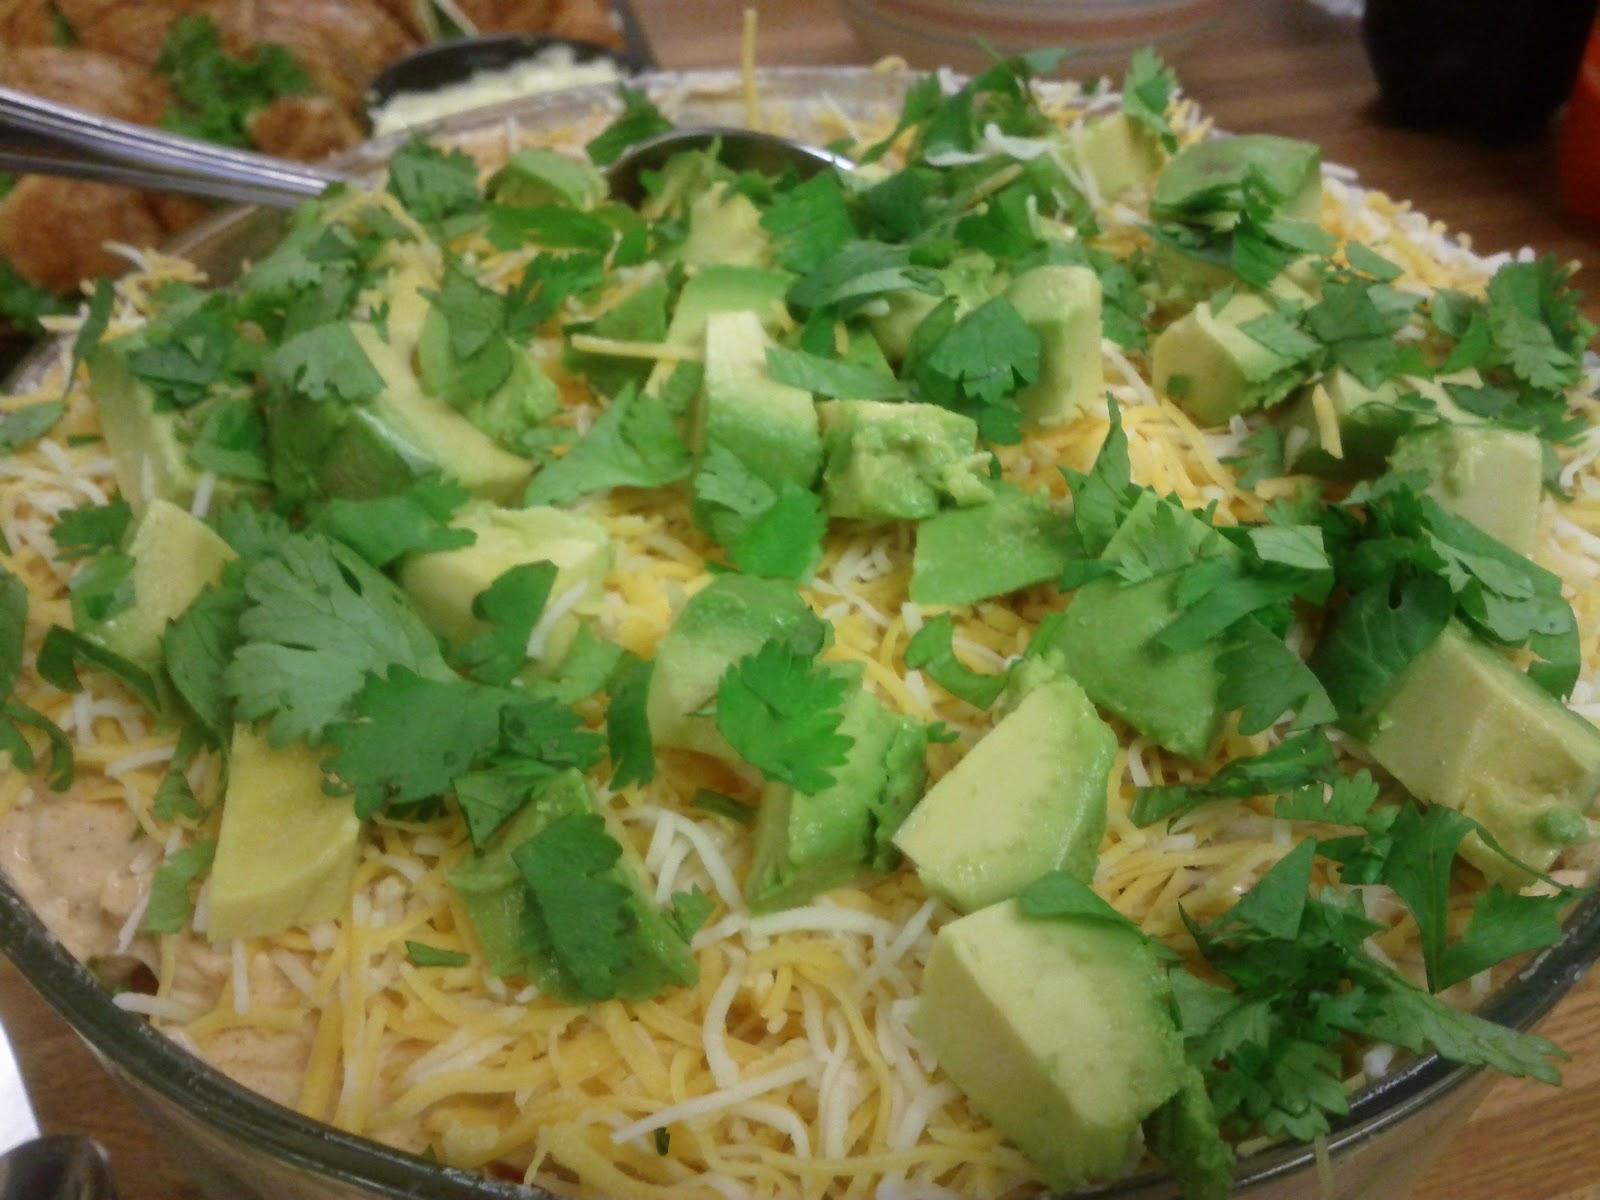 over salad refridgerate 2 hours 4 chop avocado spoon over salad ...